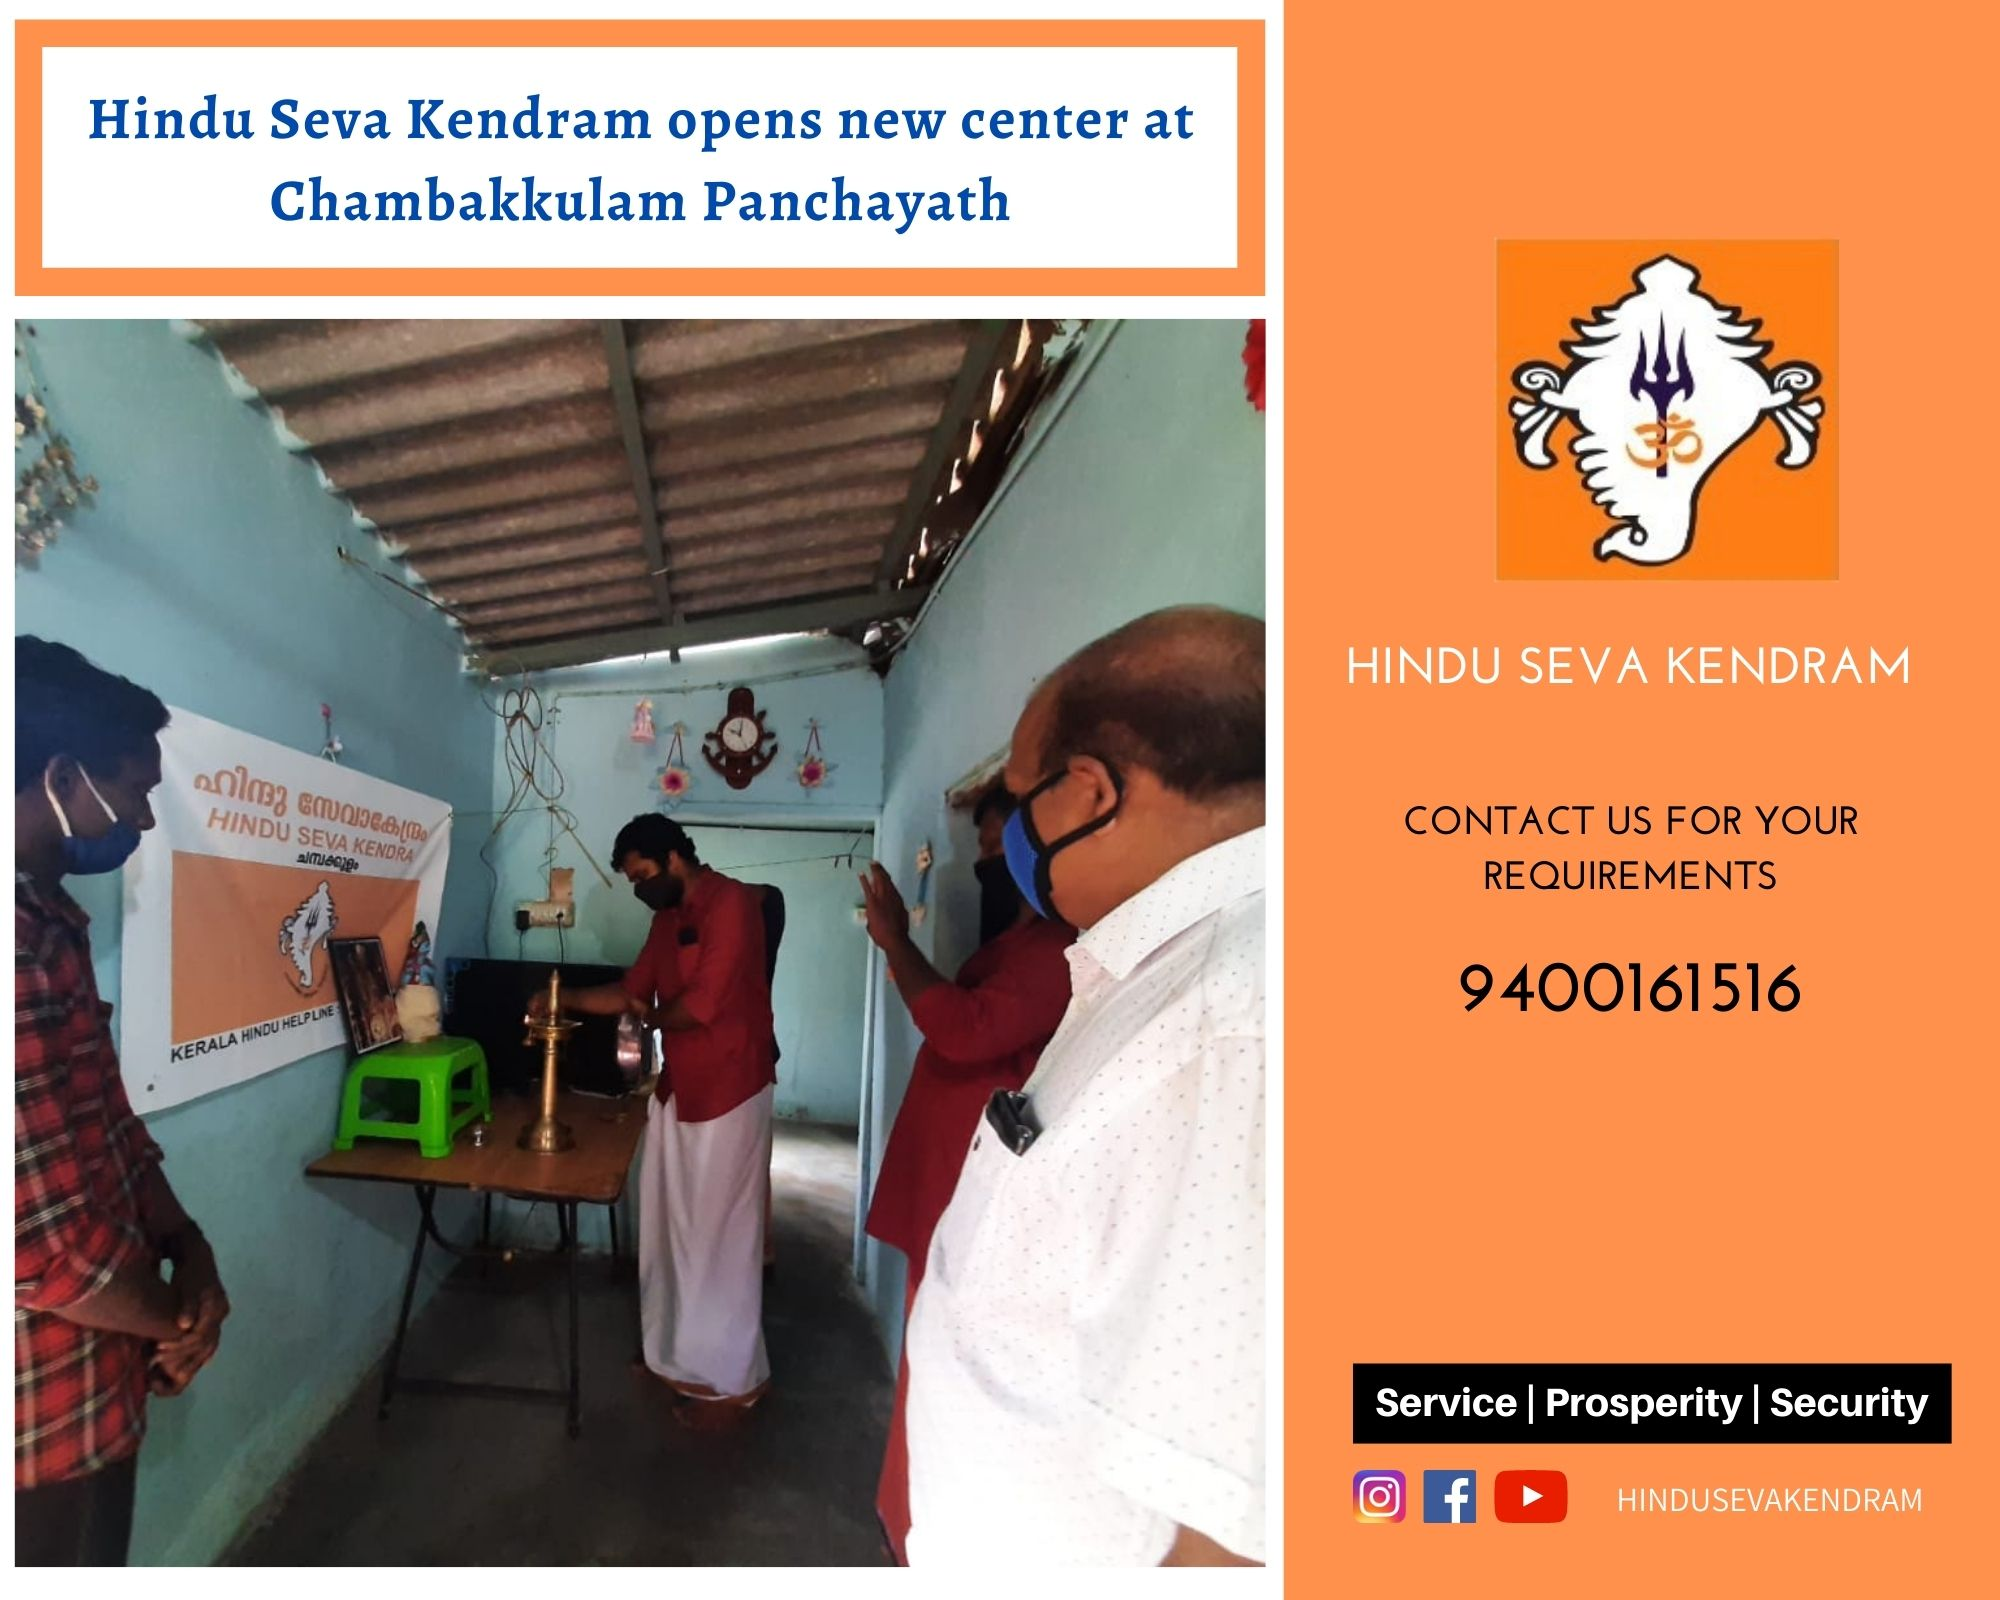 Hindu Seva Kendram opens new center at Chambakkulam Panchayath